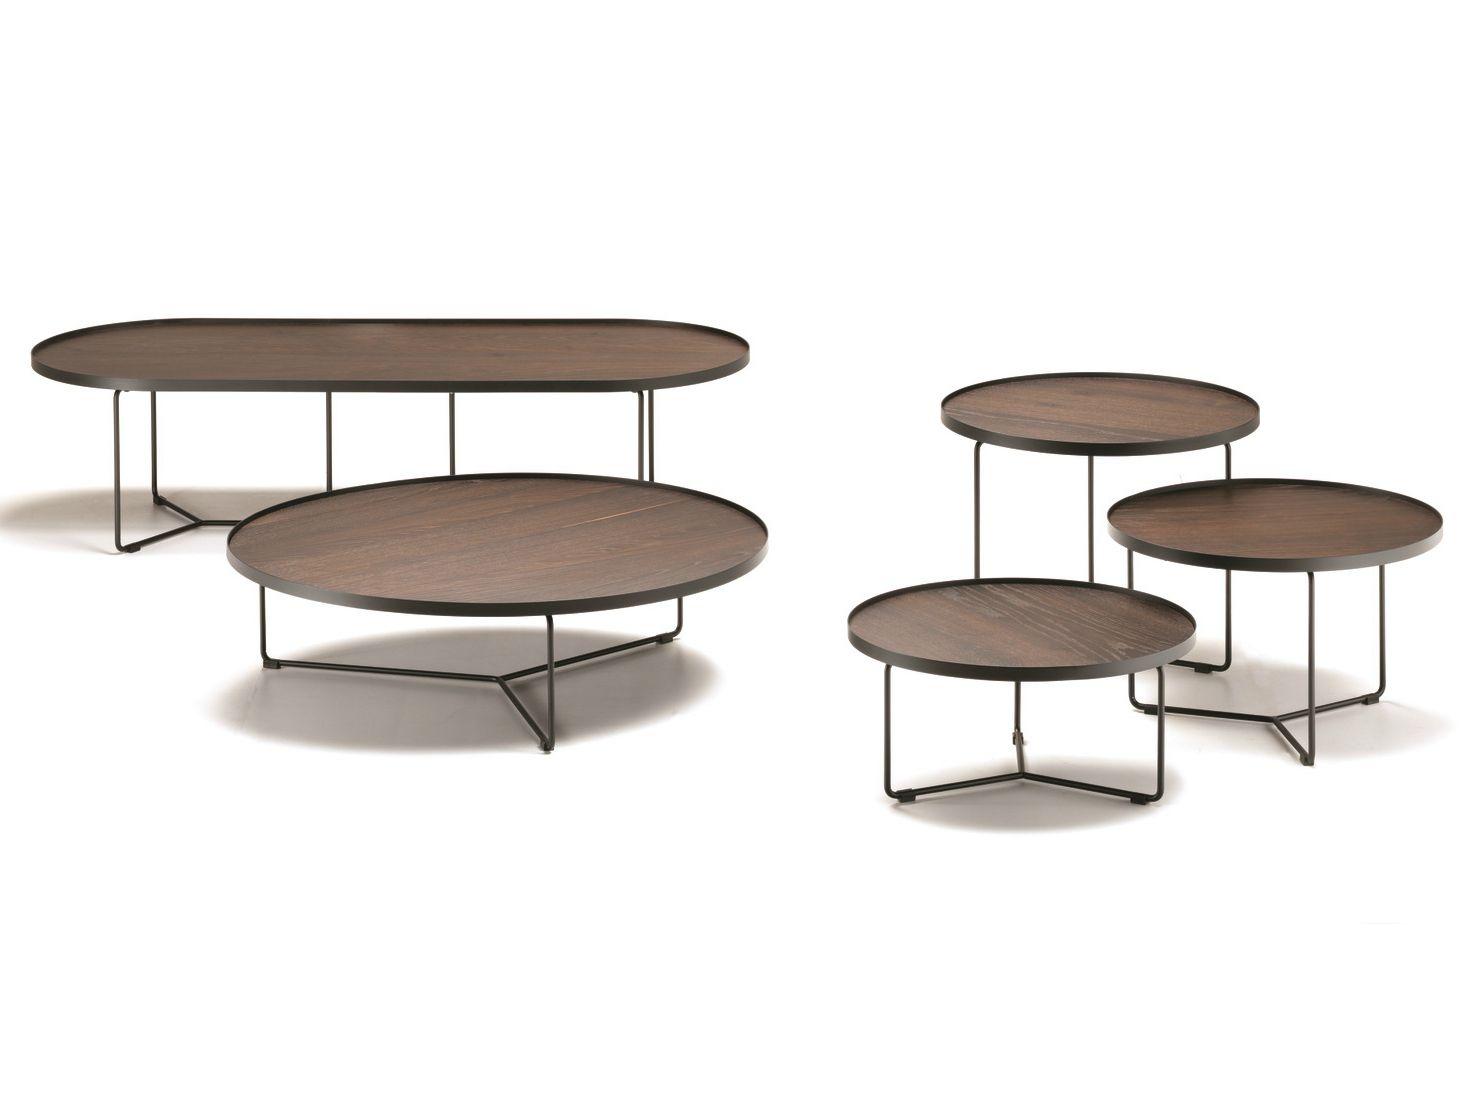 Tavolino Rotondo Legno Essenza Bim : Billy wood by cattelan italia design studio kronos